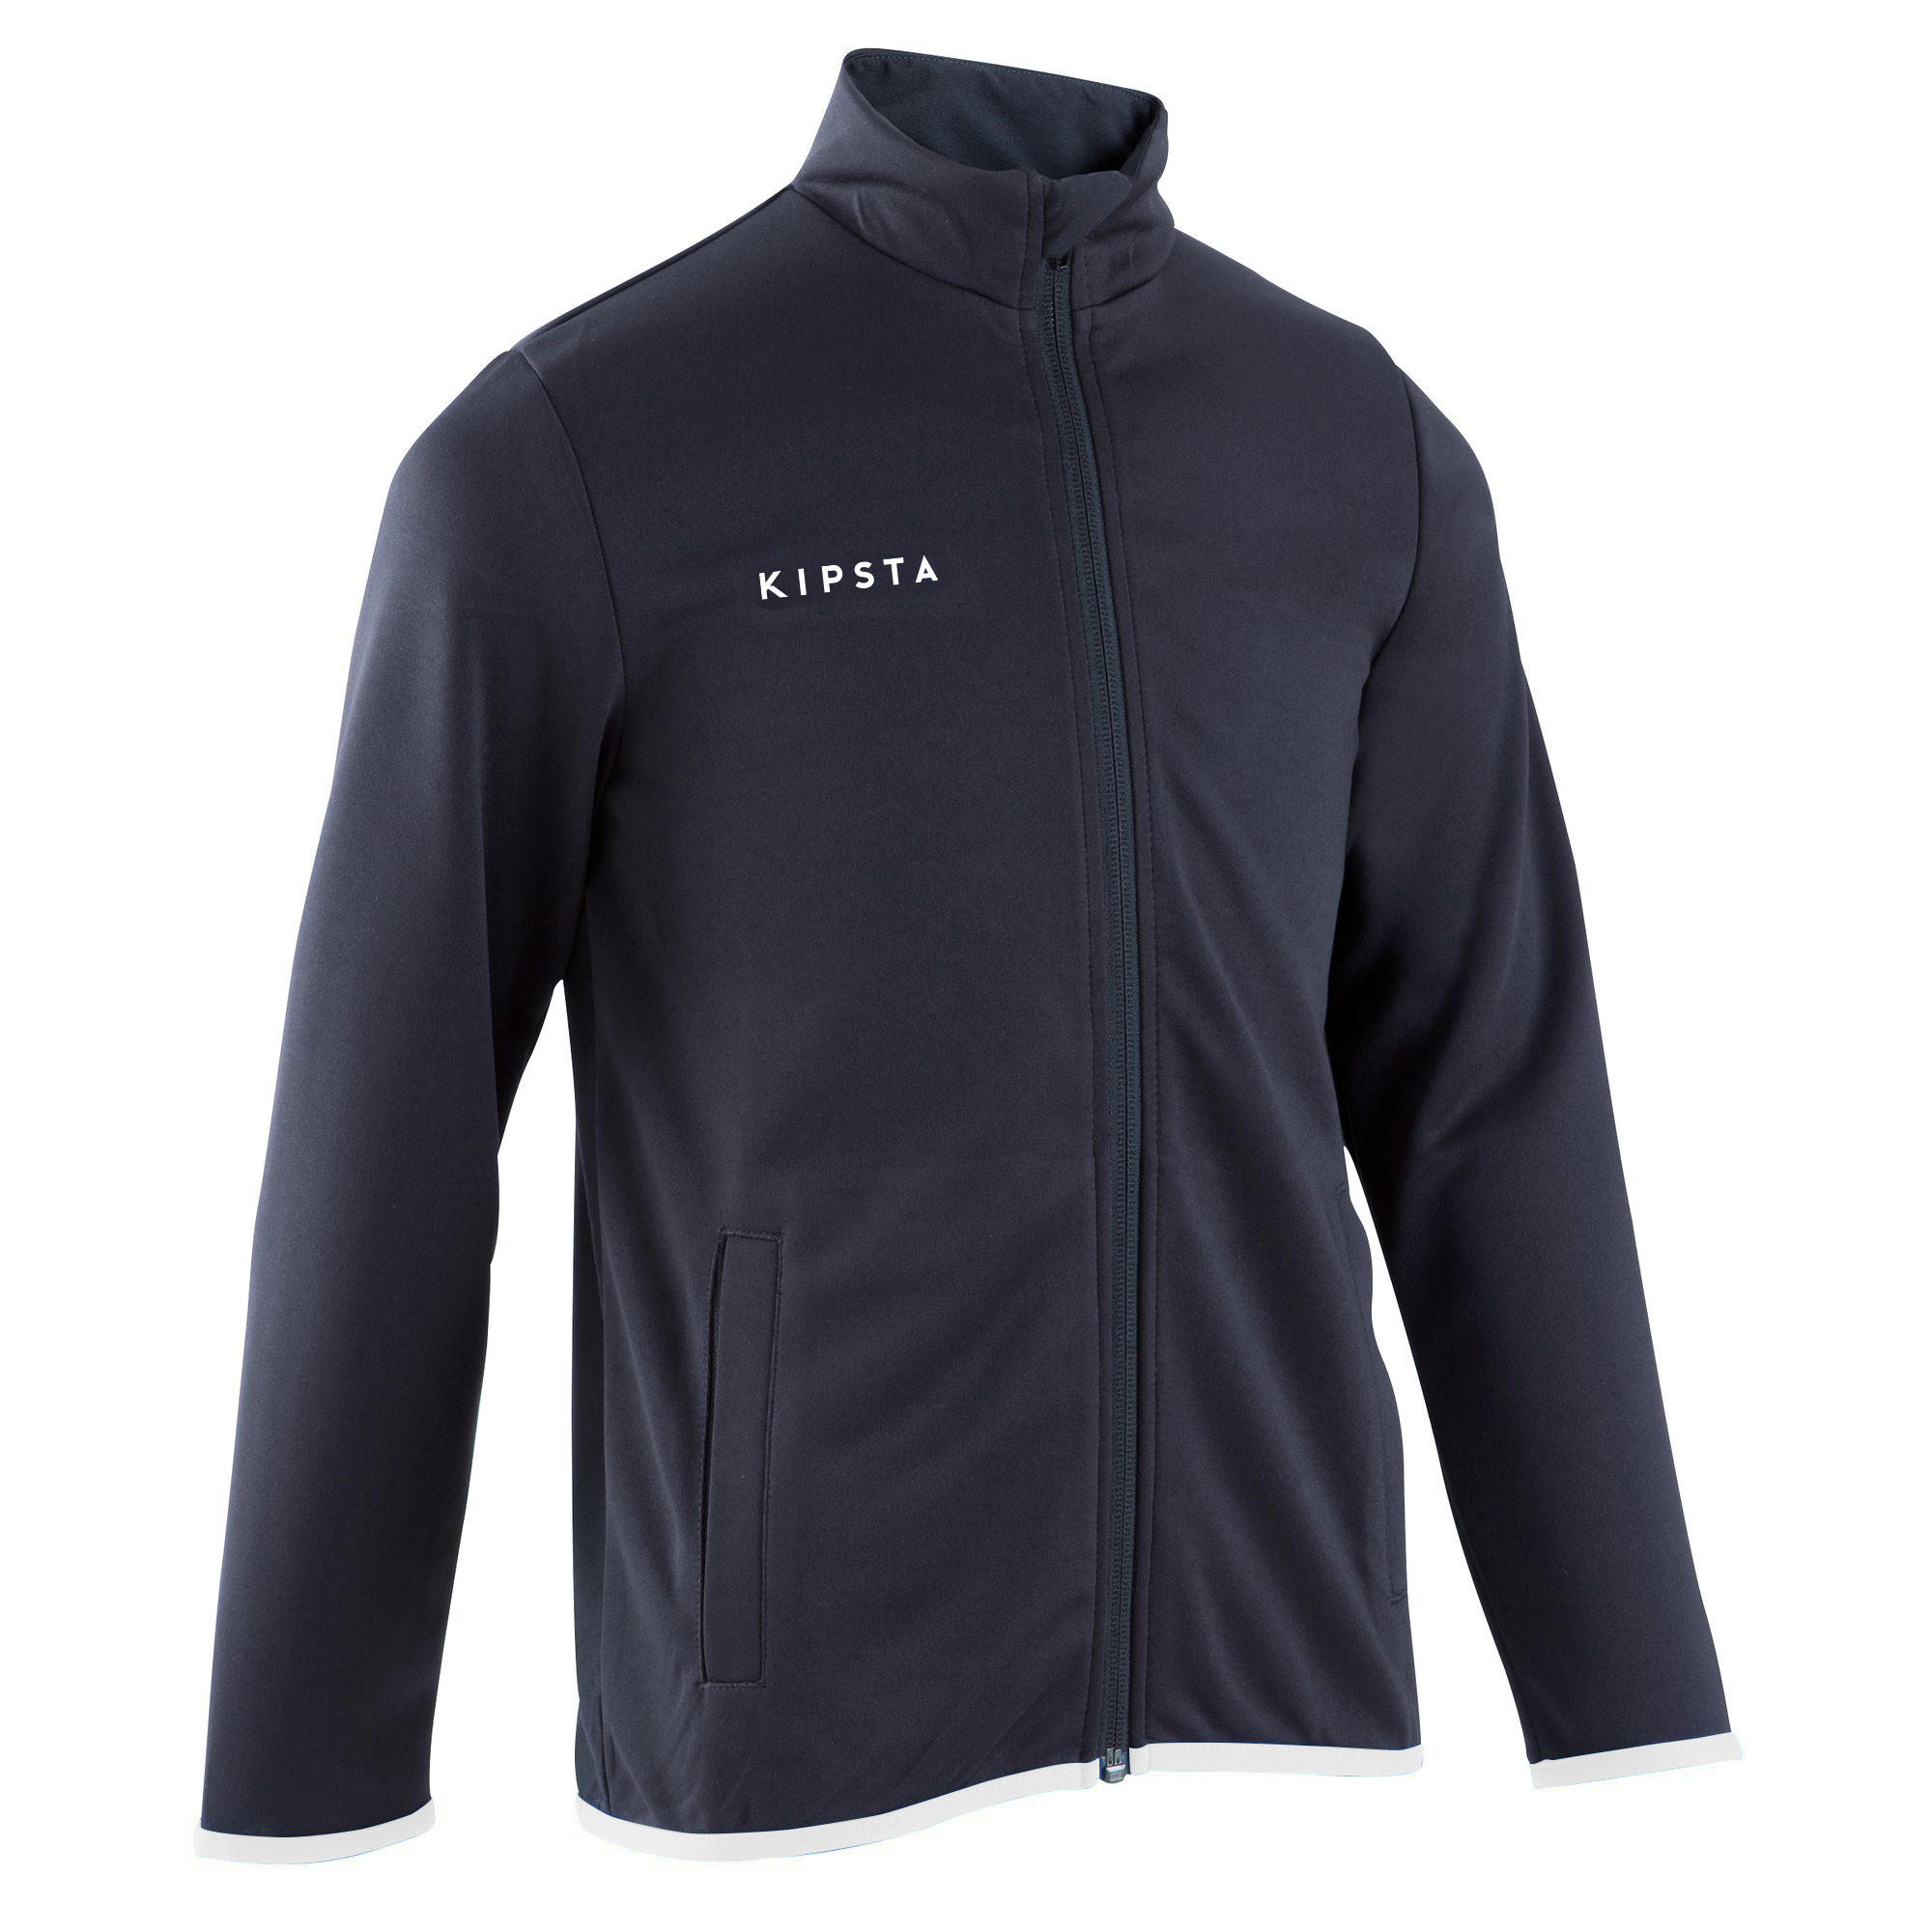 T100 Kids' Soccer Training Jacket - Black